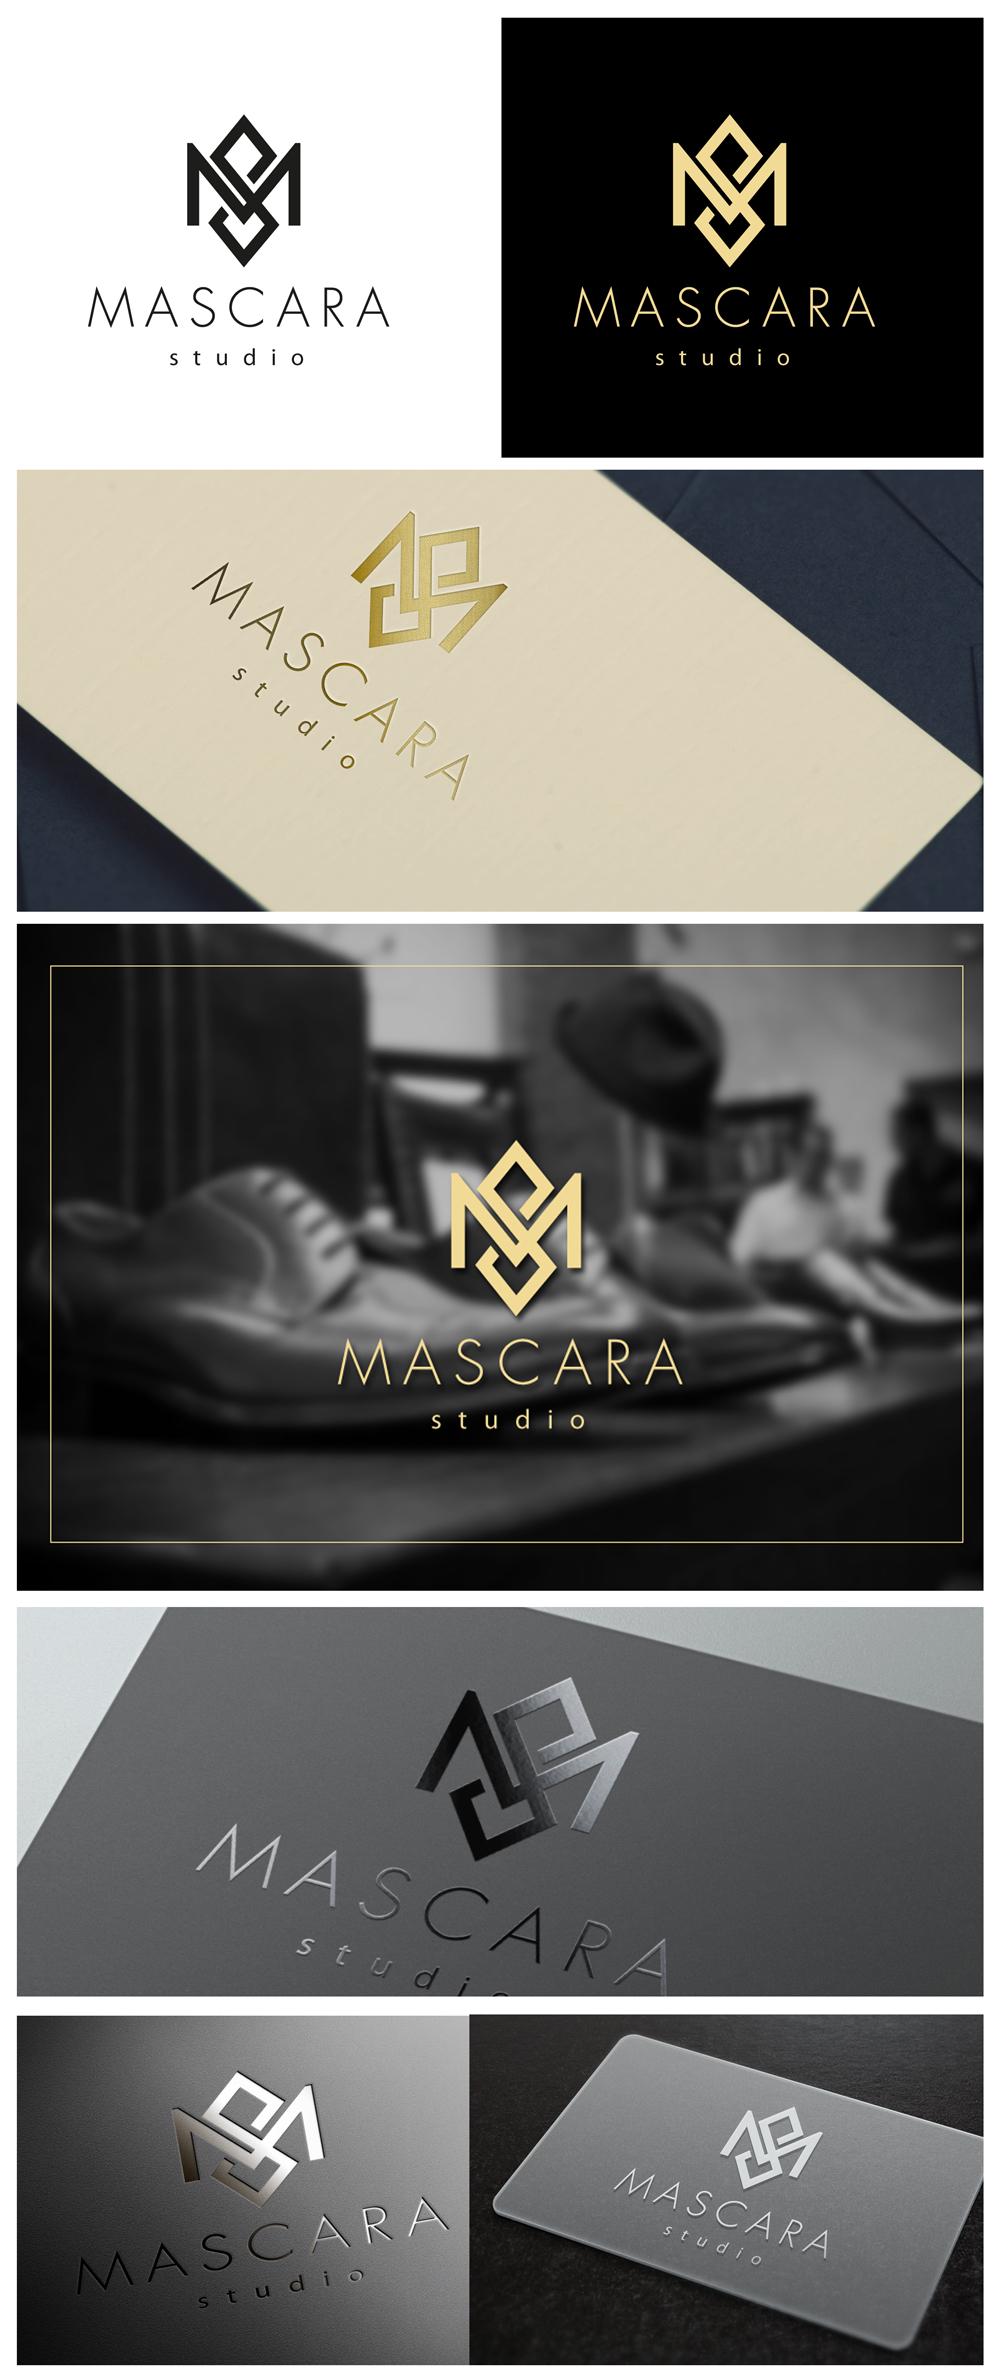 MASCARA_STUDIO_03.jpg